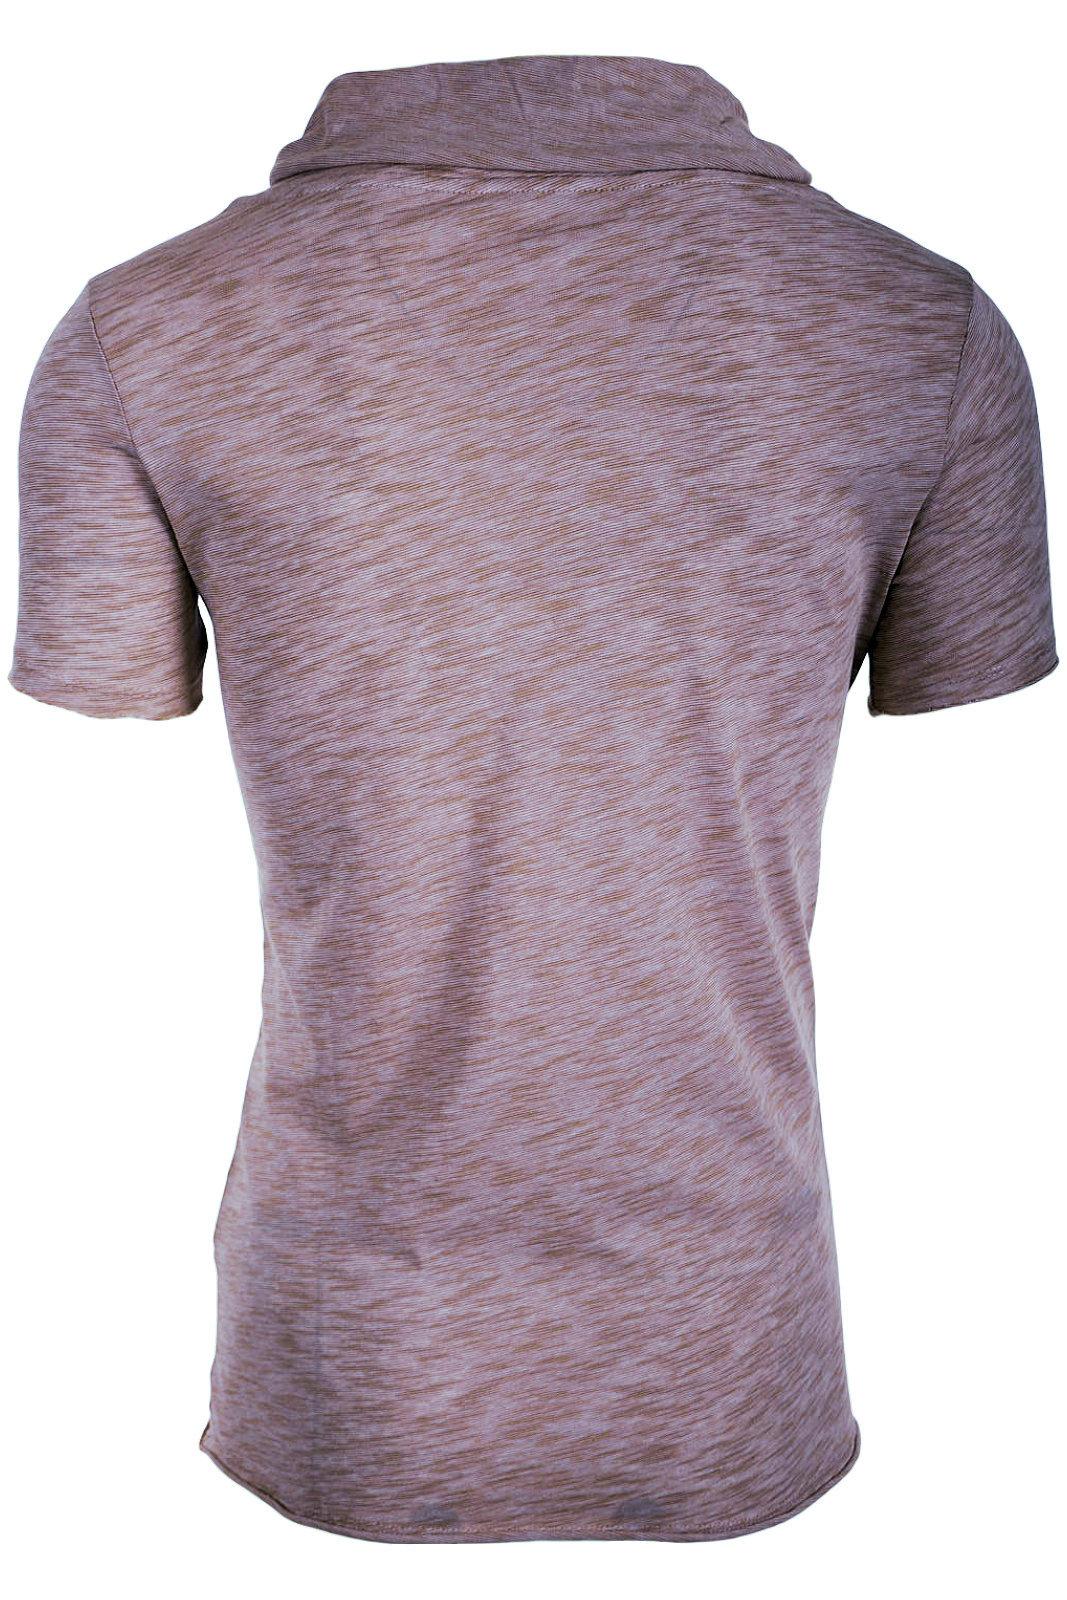 Redbridge by Cipo & Baxx Herren T Shirt V Neck Streetwear R41223 NEU